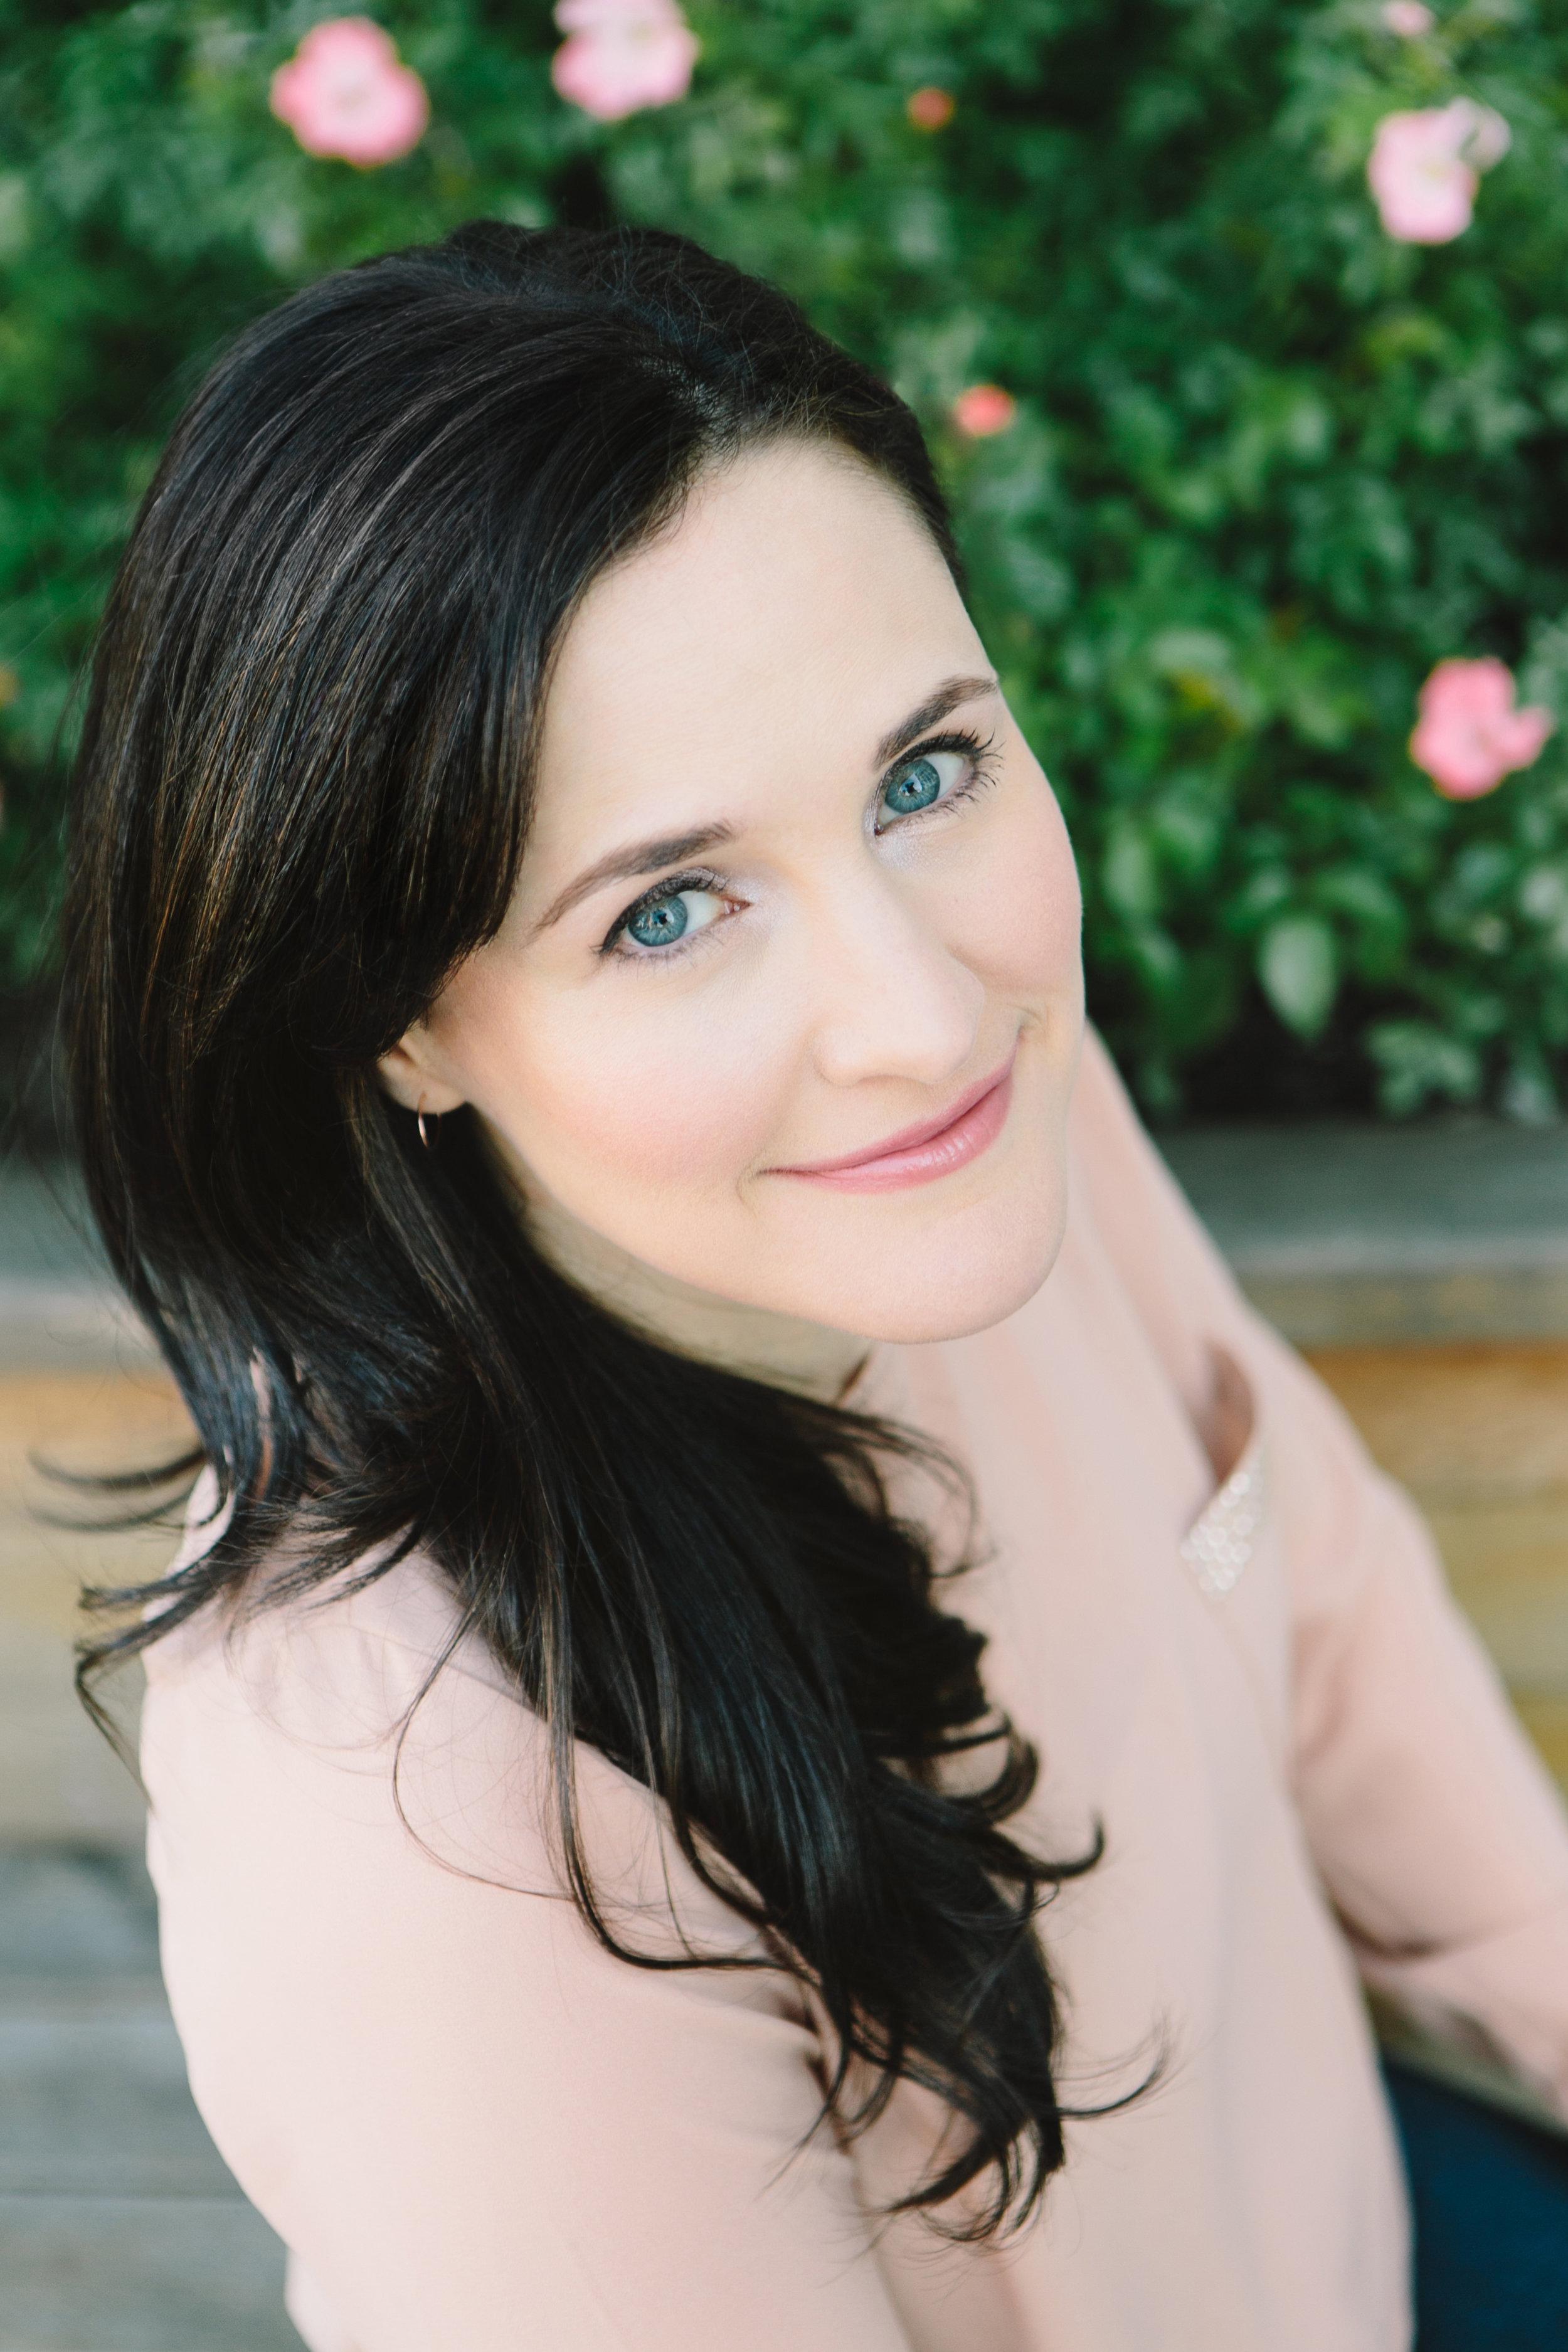 About — Sarah Mlynowski